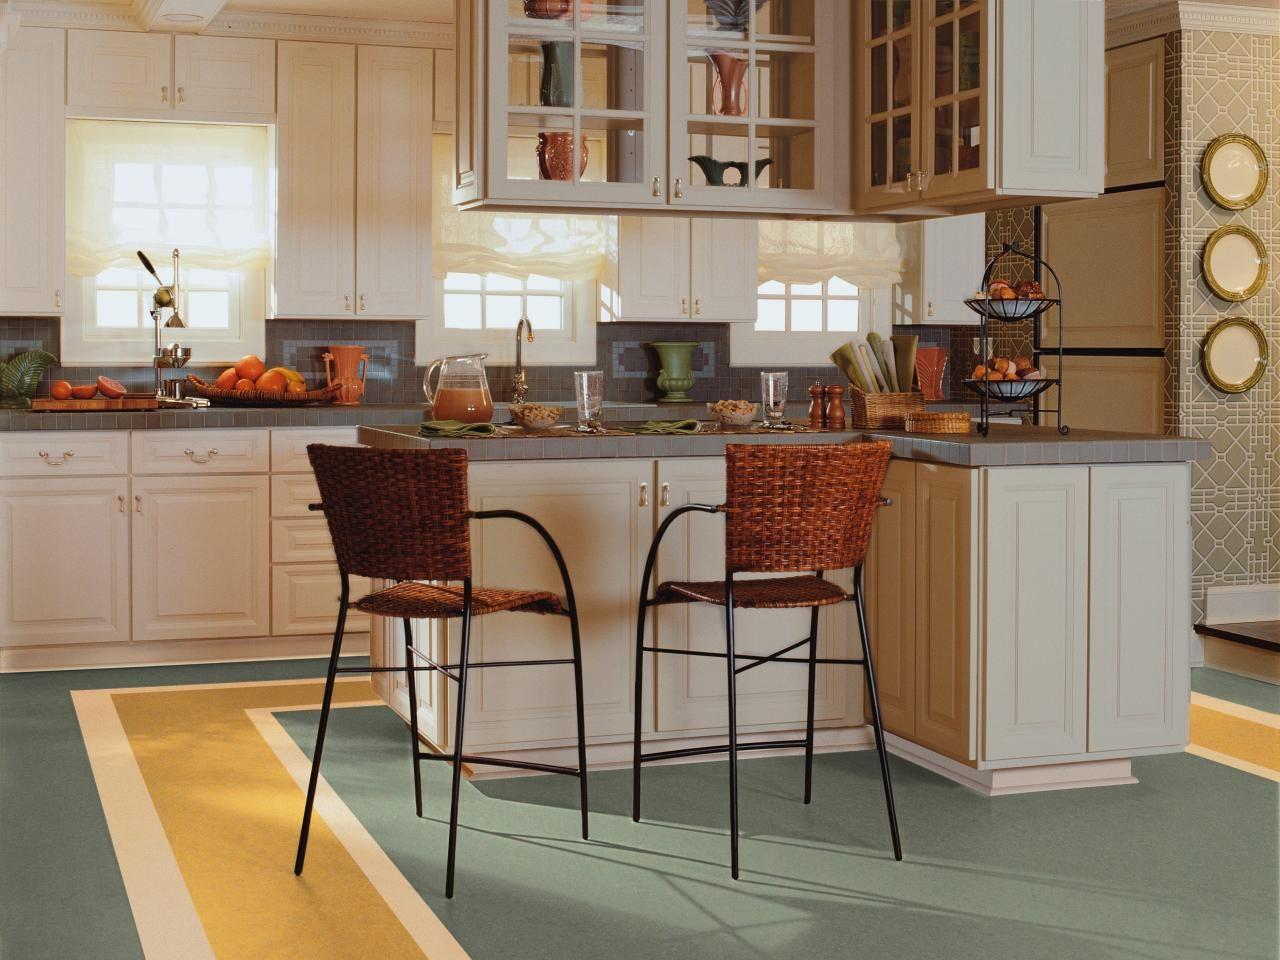 Kitchen Floor Linoleum